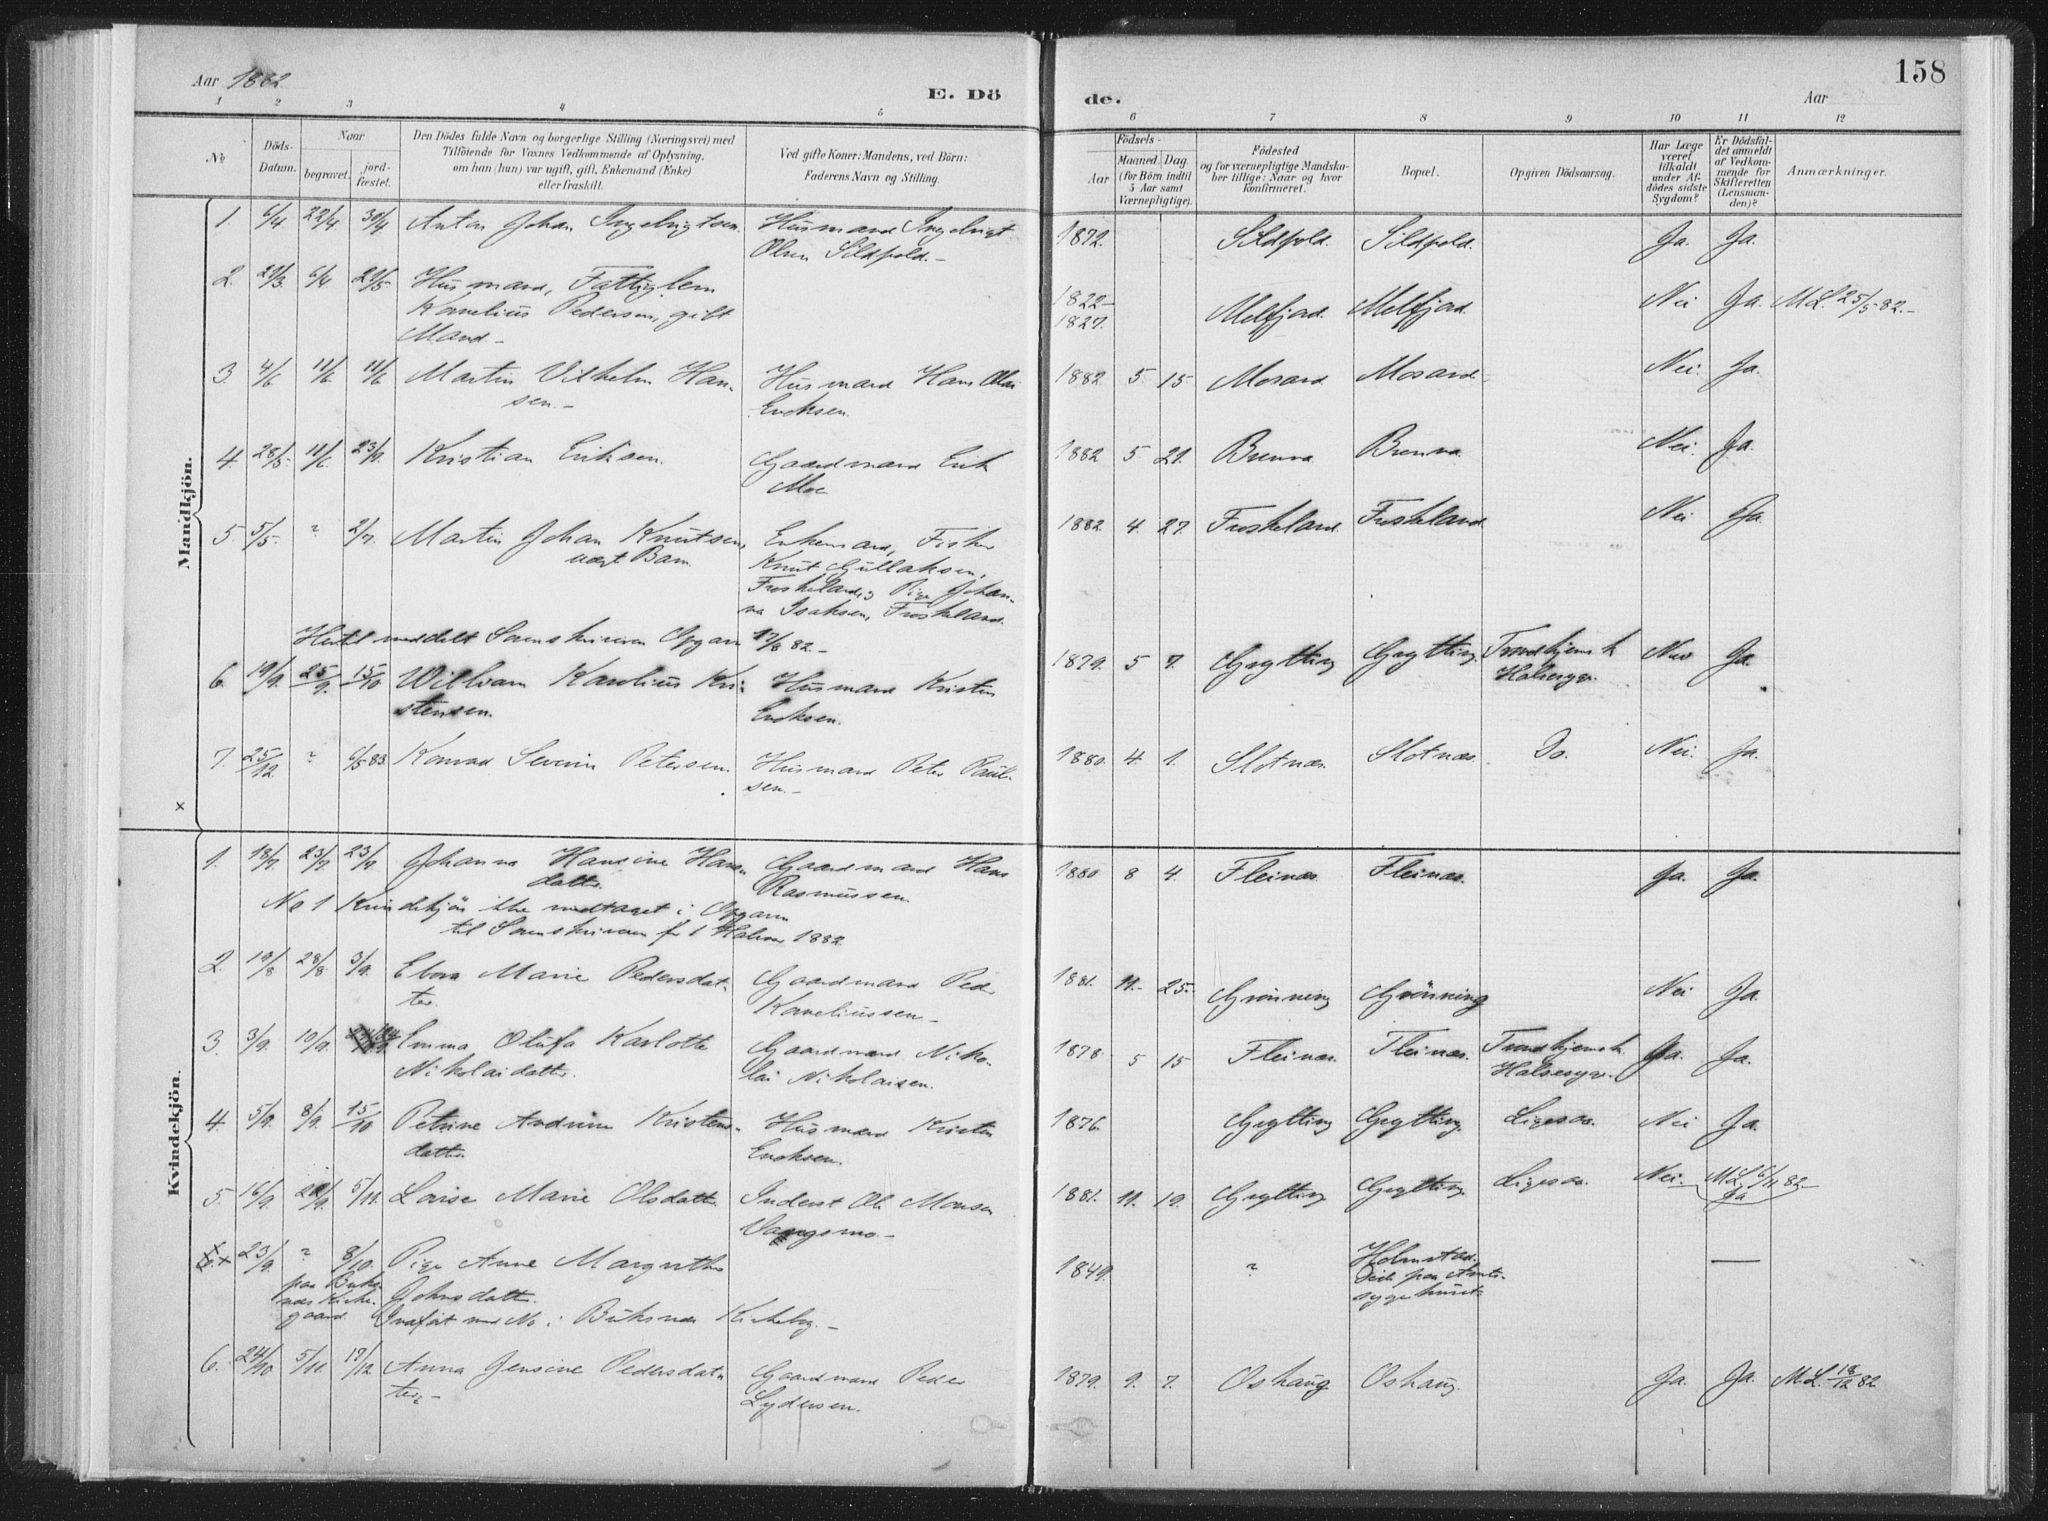 SAT, Ministerialprotokoller, klokkerbøker og fødselsregistre - Nordland, 890/L1286: Ministerialbok nr. 890A01, 1882-1902, s. 158